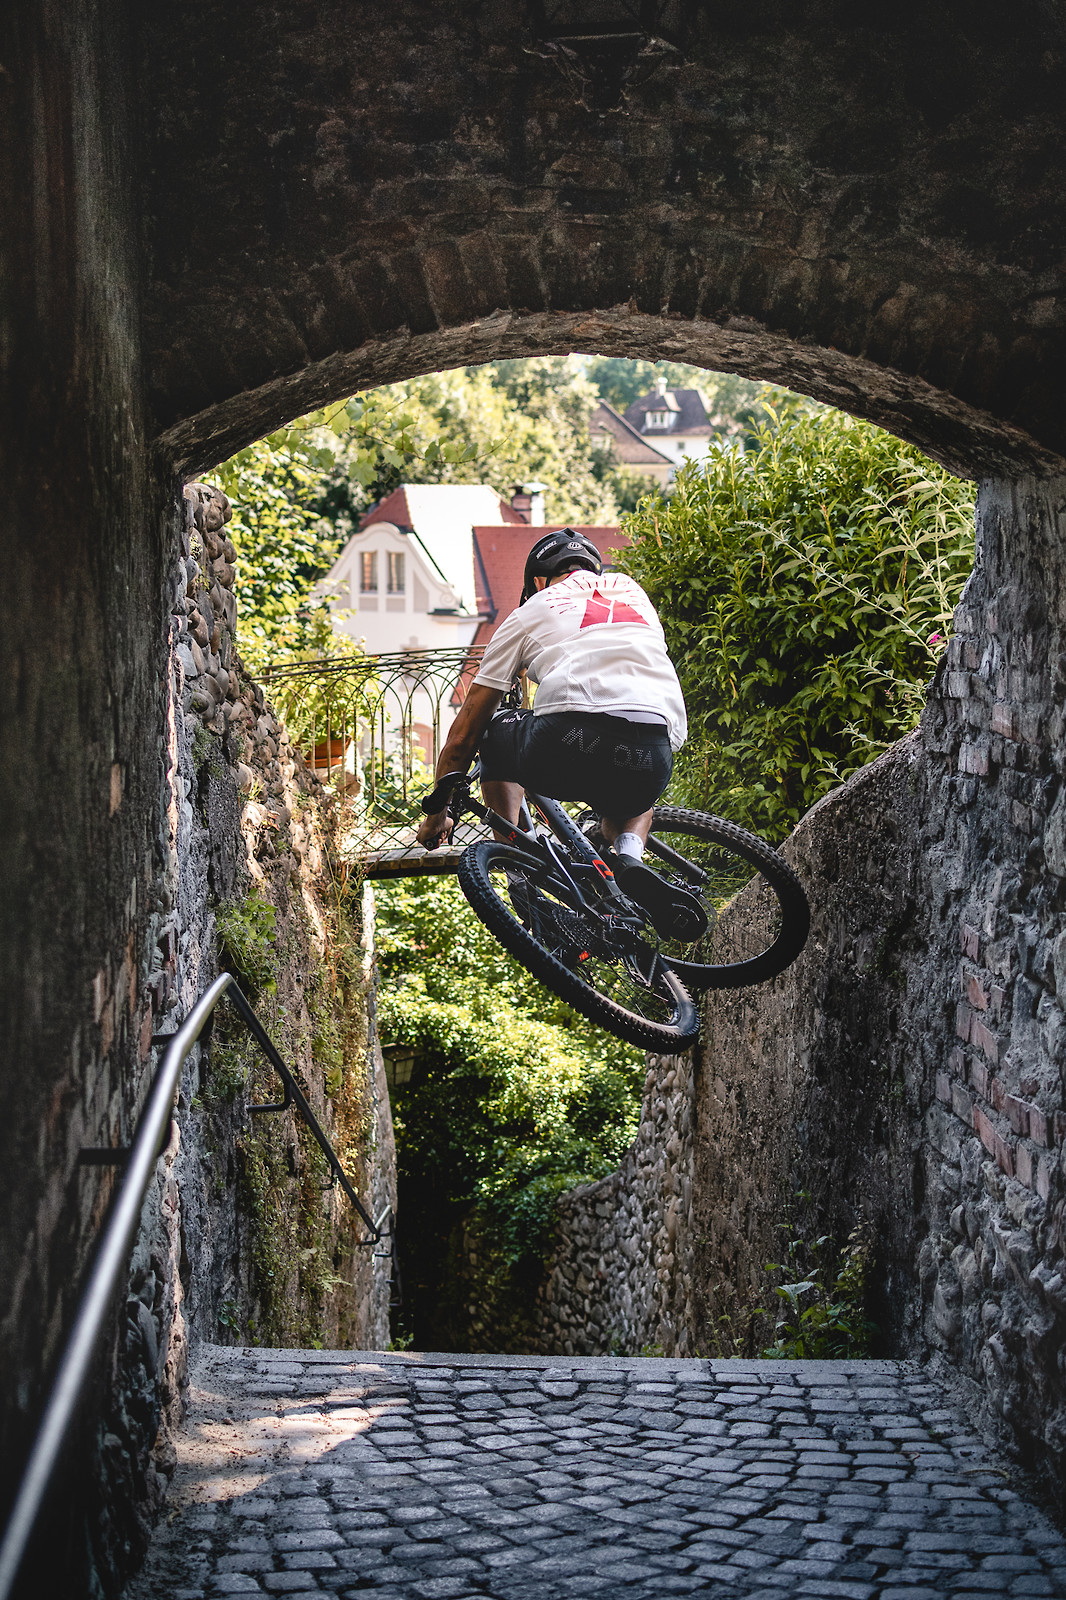 Through the tunnel  - Korbinian Engstler - Mountain Biking Pictures - Vital MTB